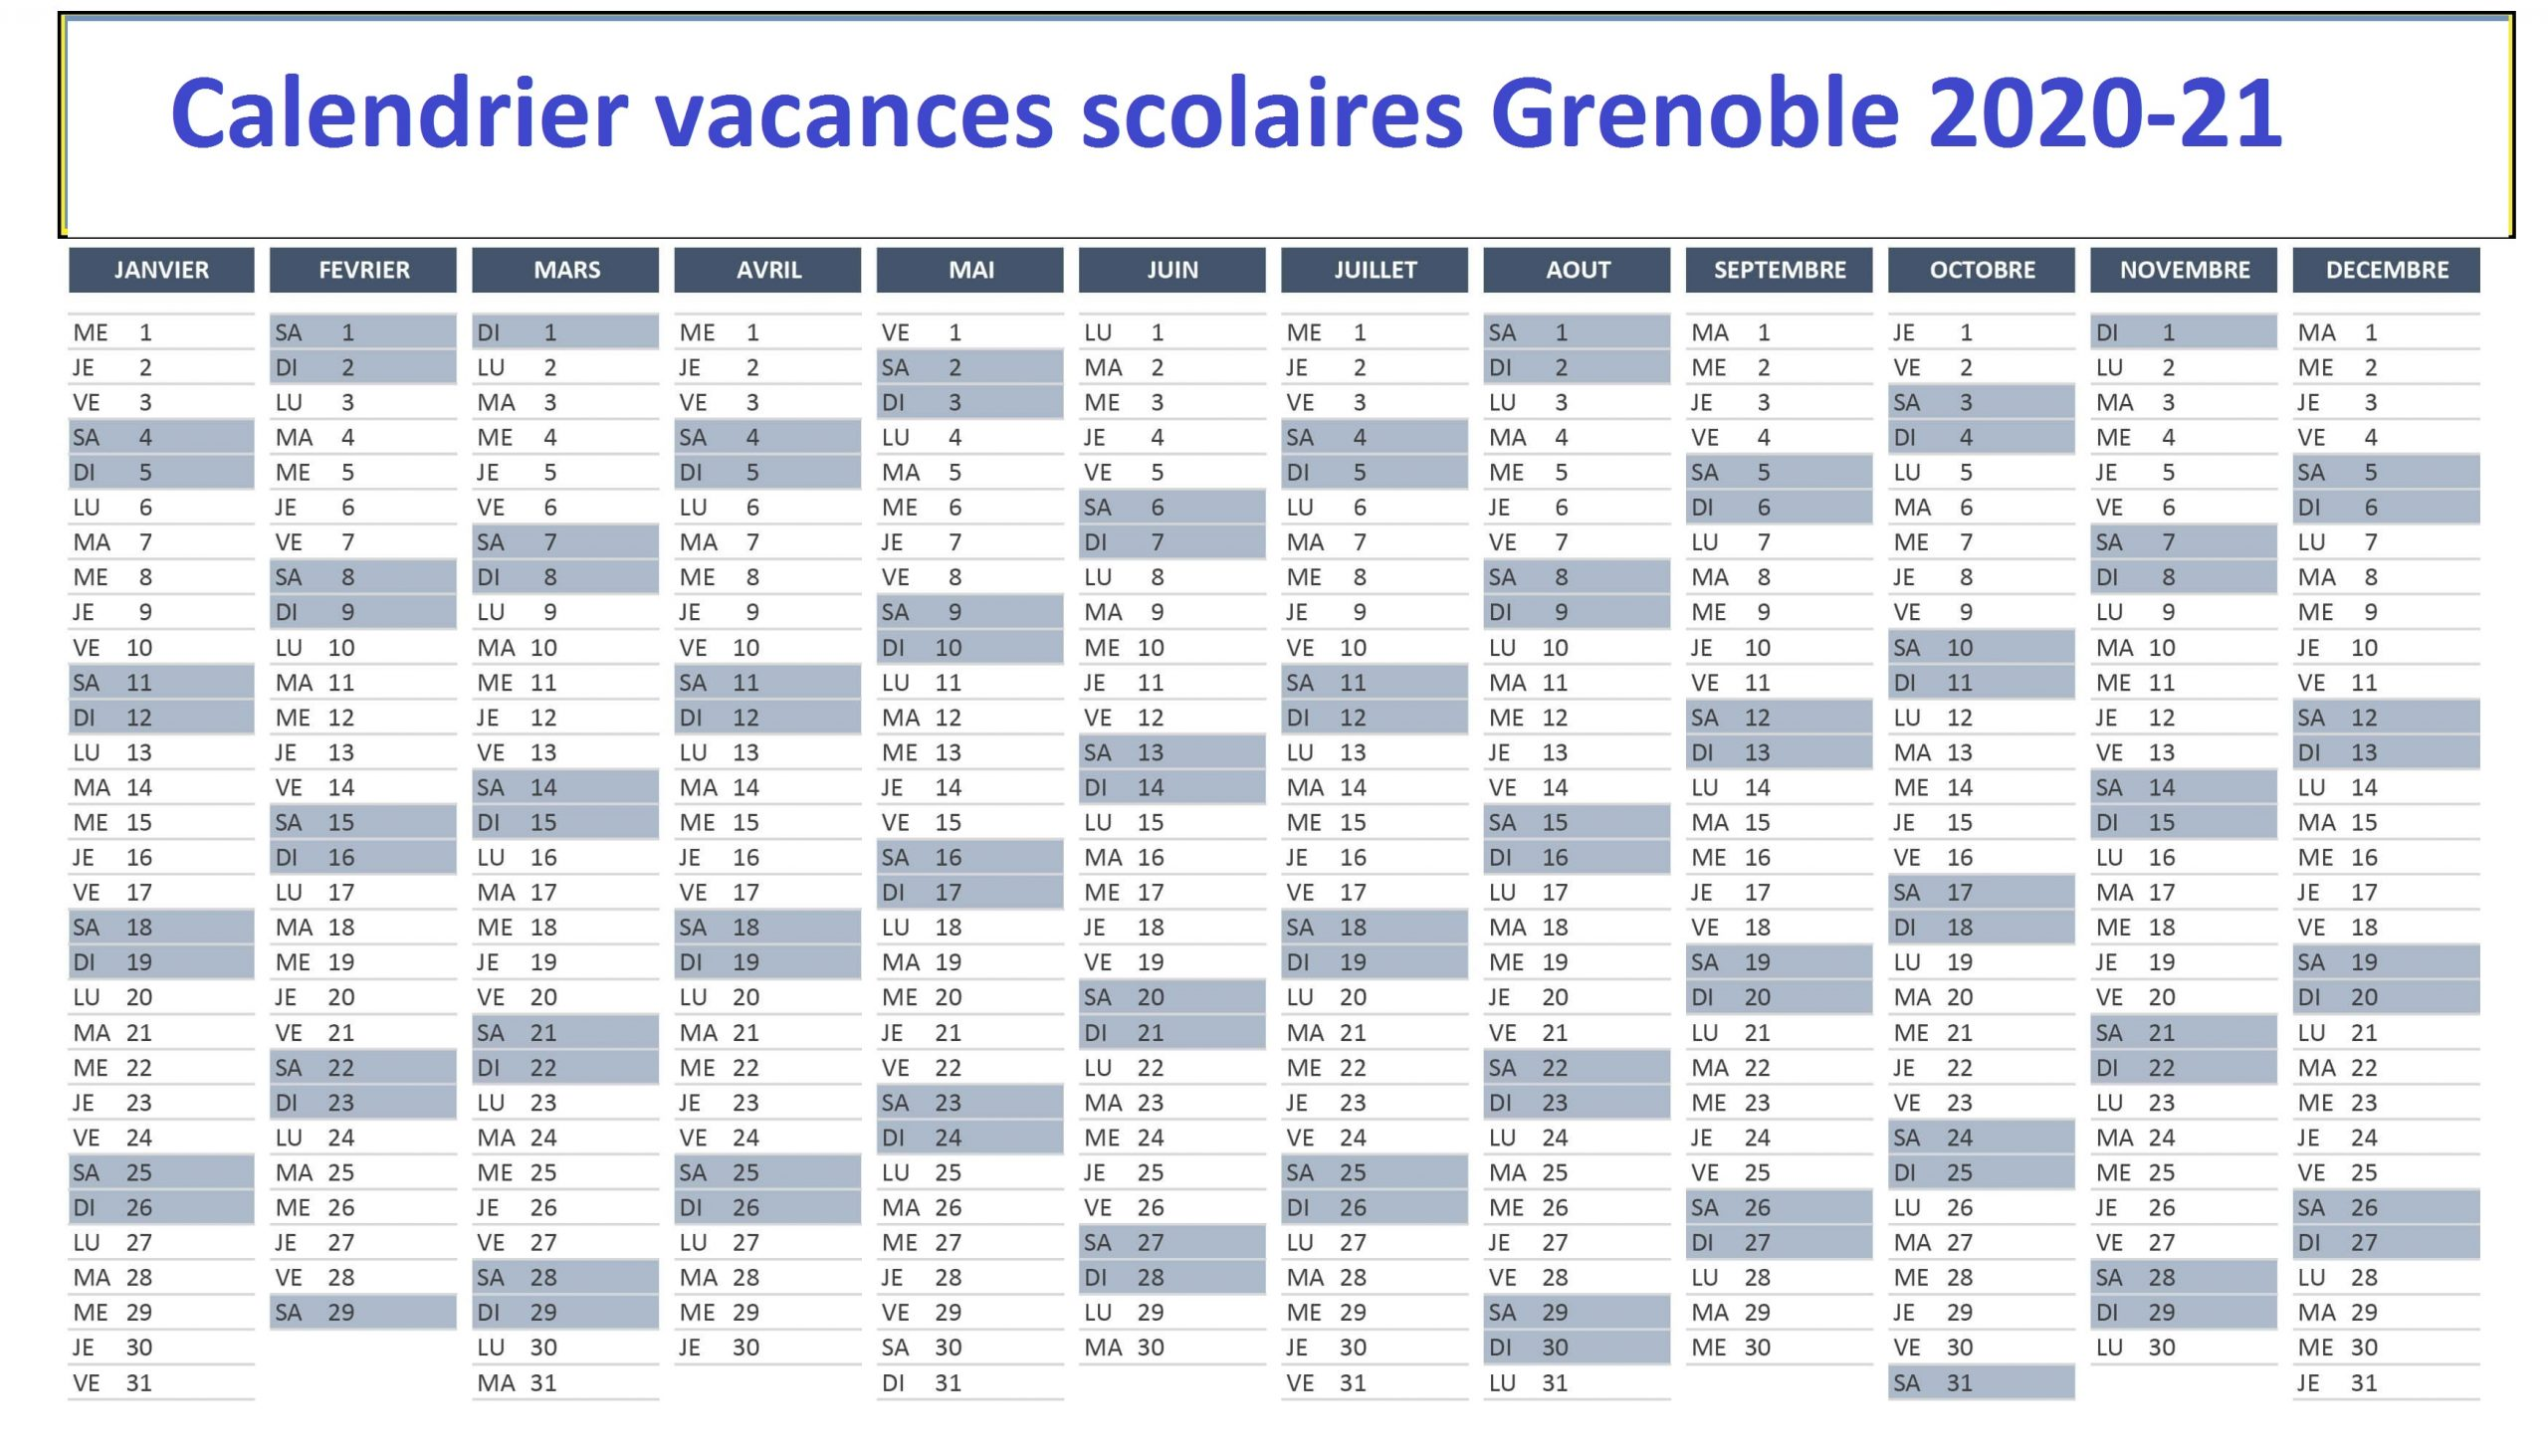 Calendrier vacances scolaires Grenoble 2020 21 Pdf